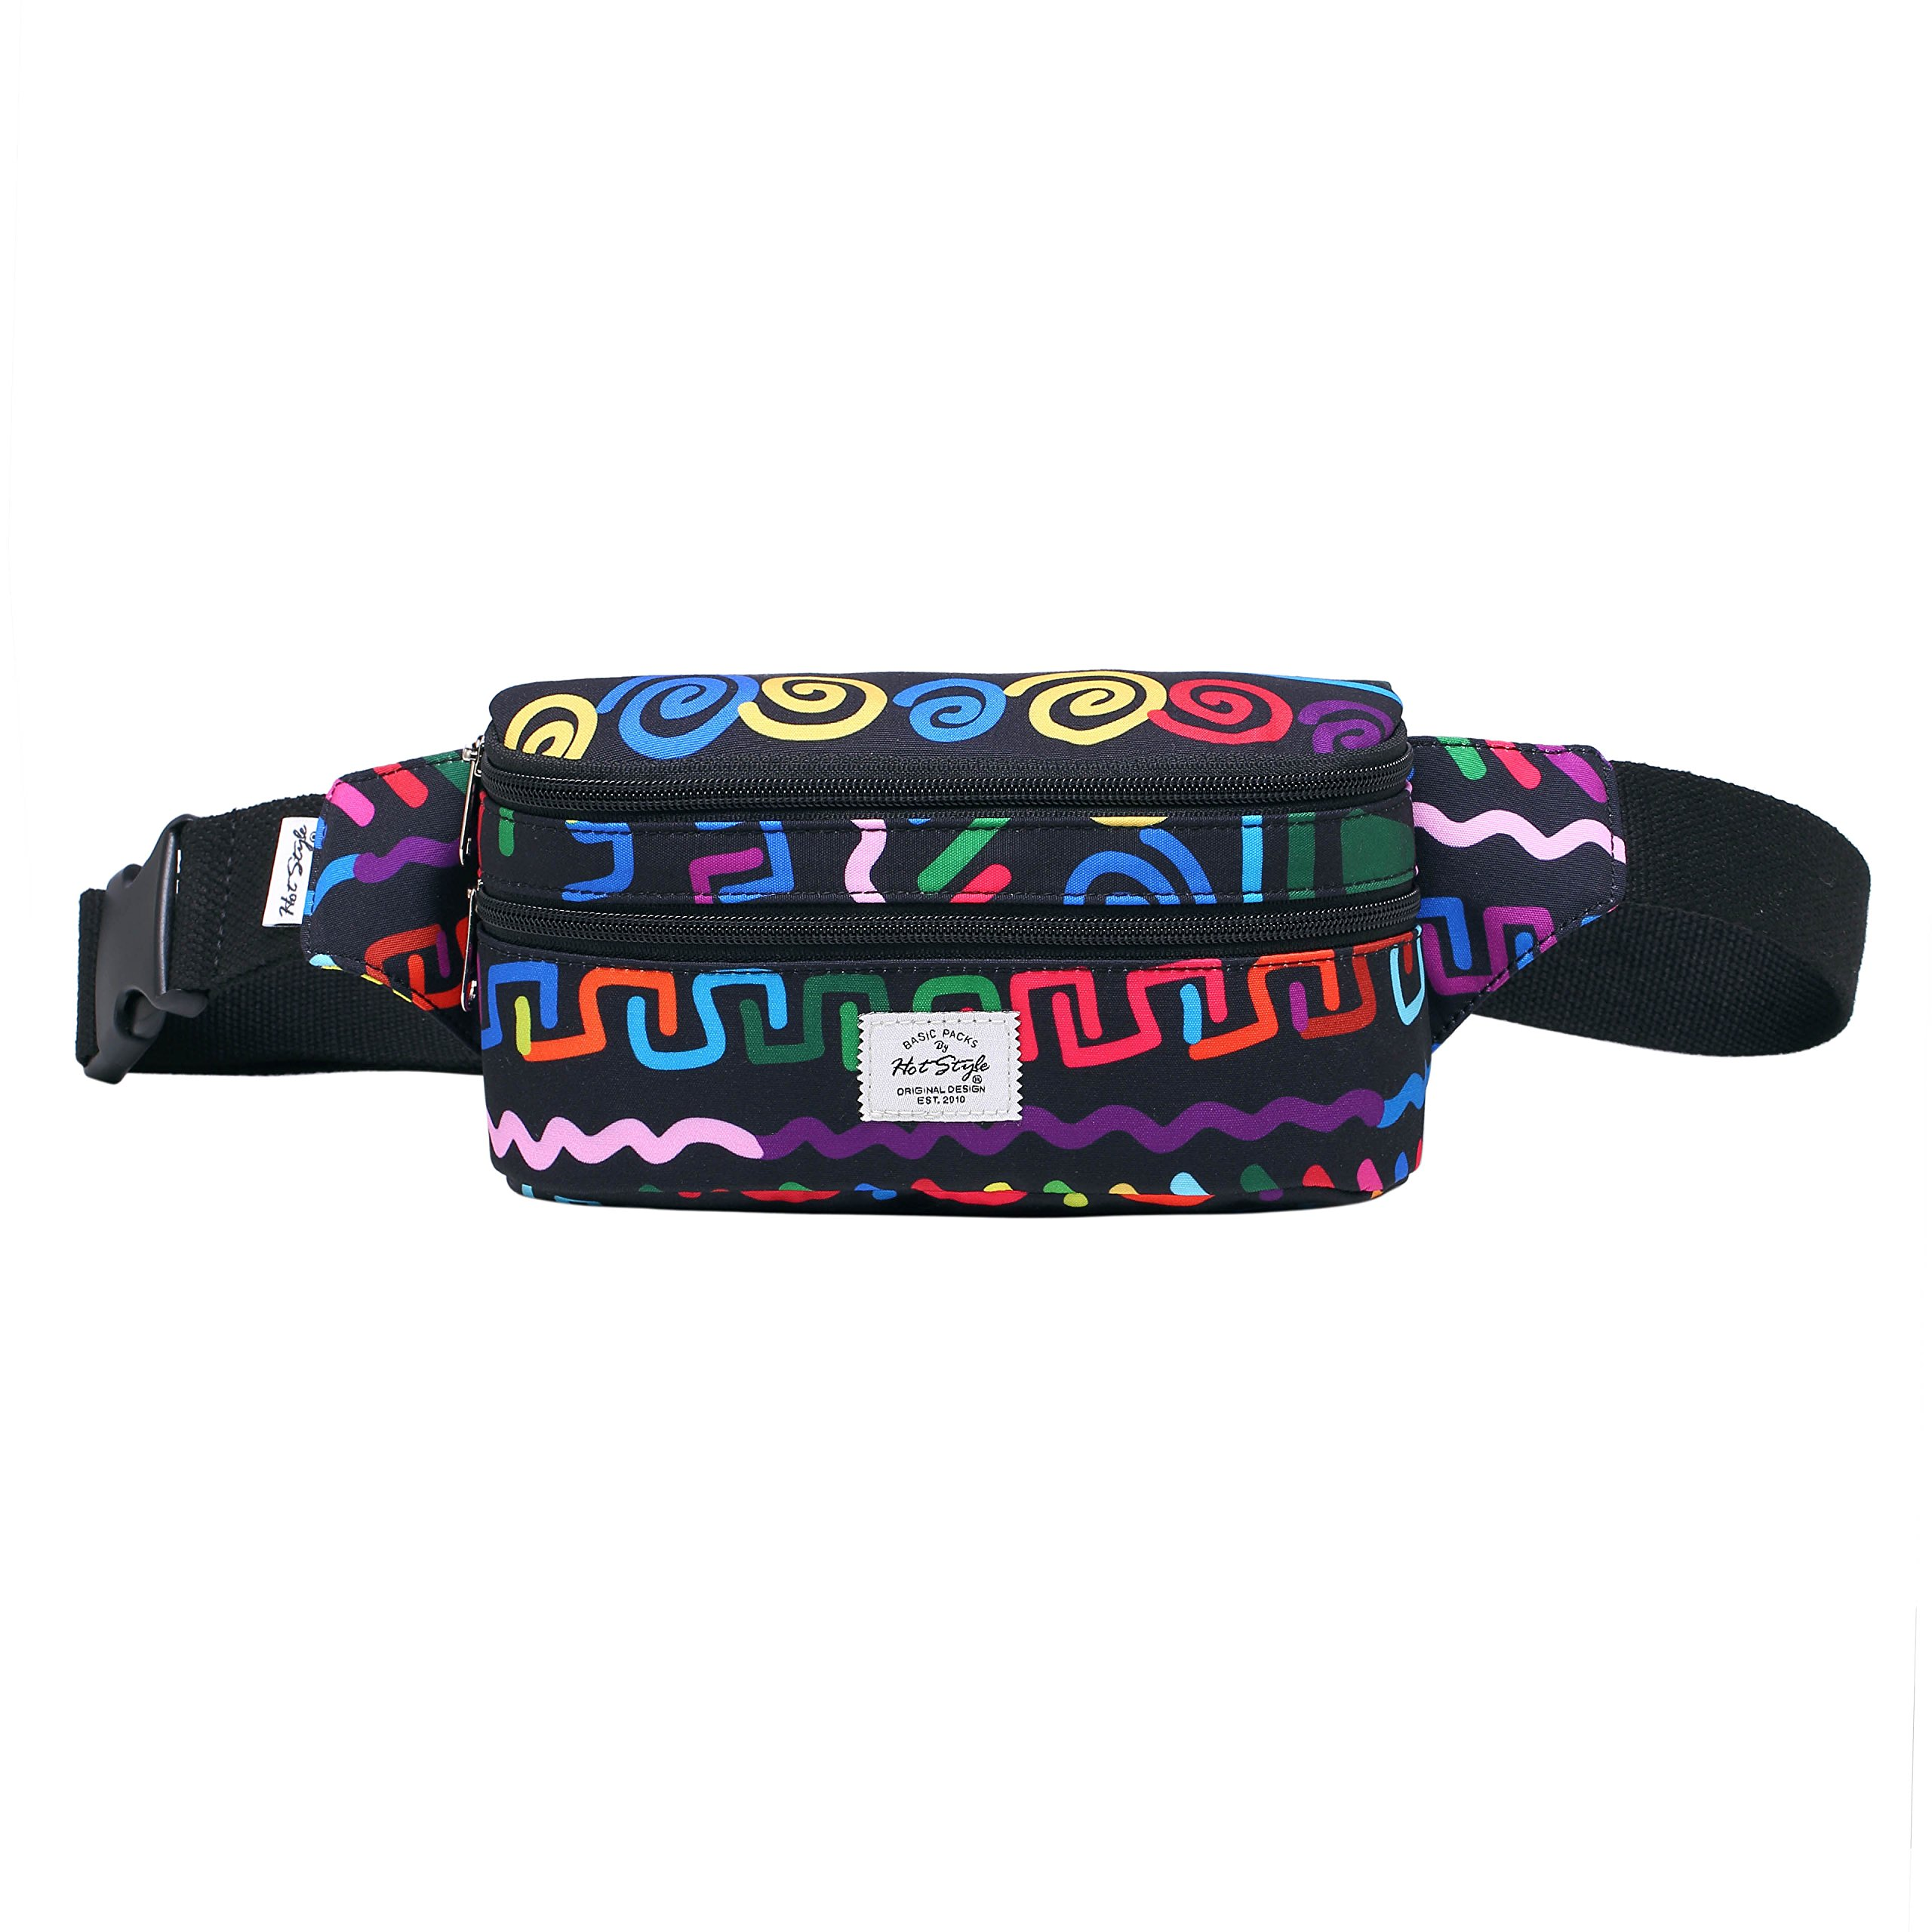 521s Fashion Waist Bag Cute Fanny Pack | 8.0''x2.5''x4.3'' | Ethnic Colorful